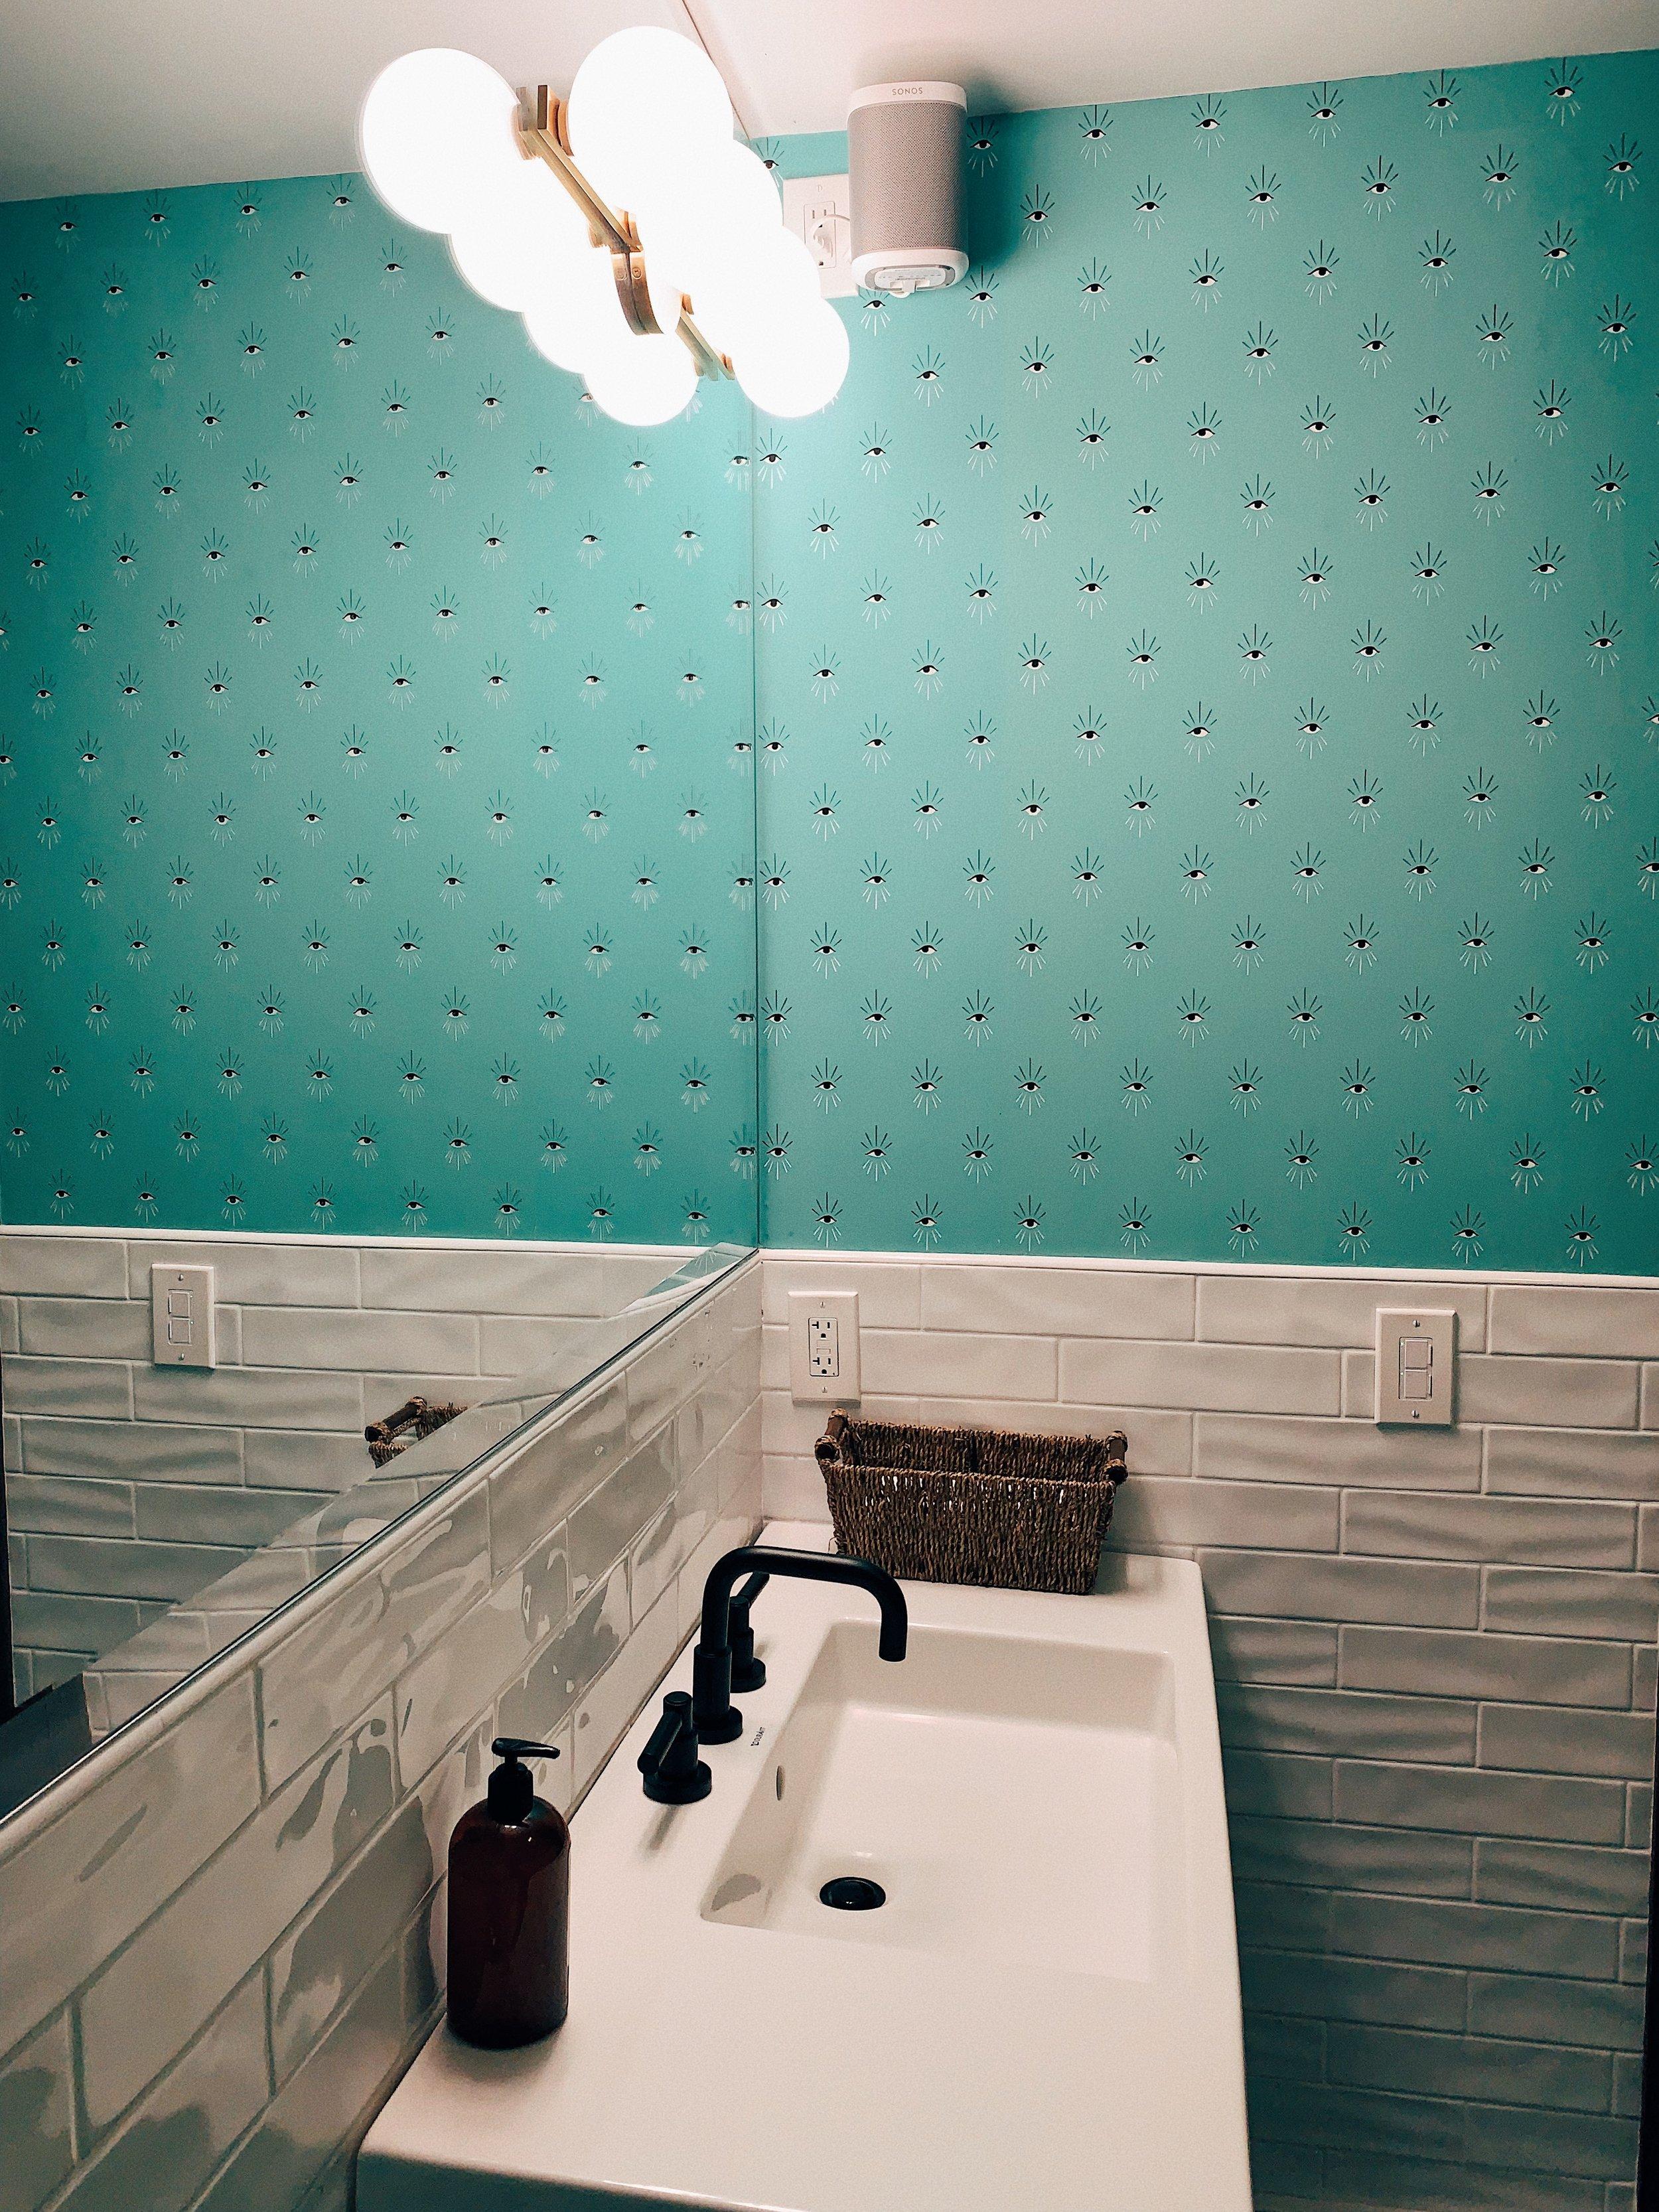 skyview motel bathroom wallpaper